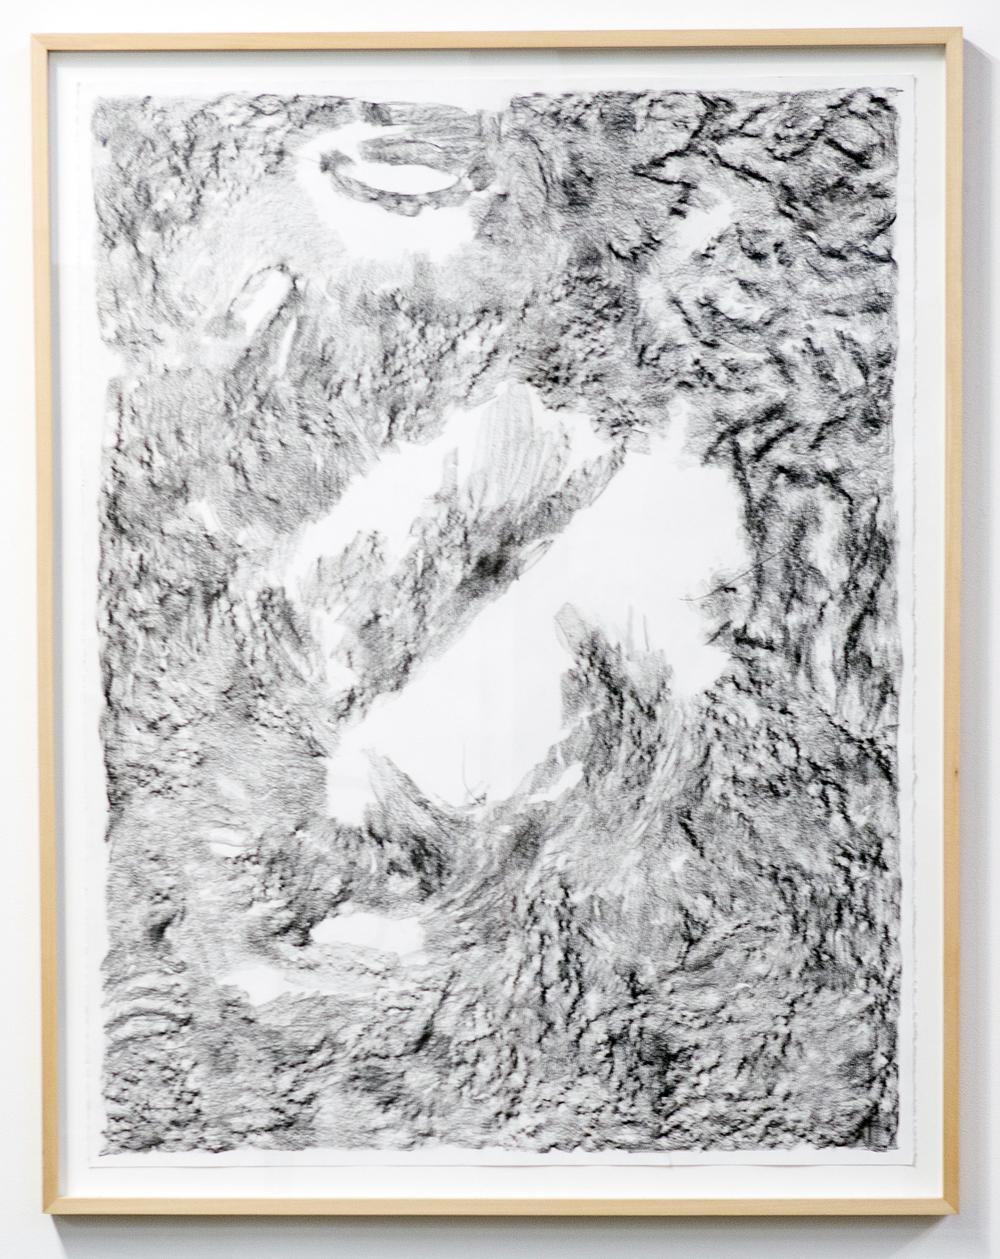 MLSL_01_ElysianPark, 2015 Conté on rag paper Paper 49.75 x 38.5 in (126.37 x 97.79 cm) Framed 52.25 x 42.5 in (132.72 x 107.95 cm)